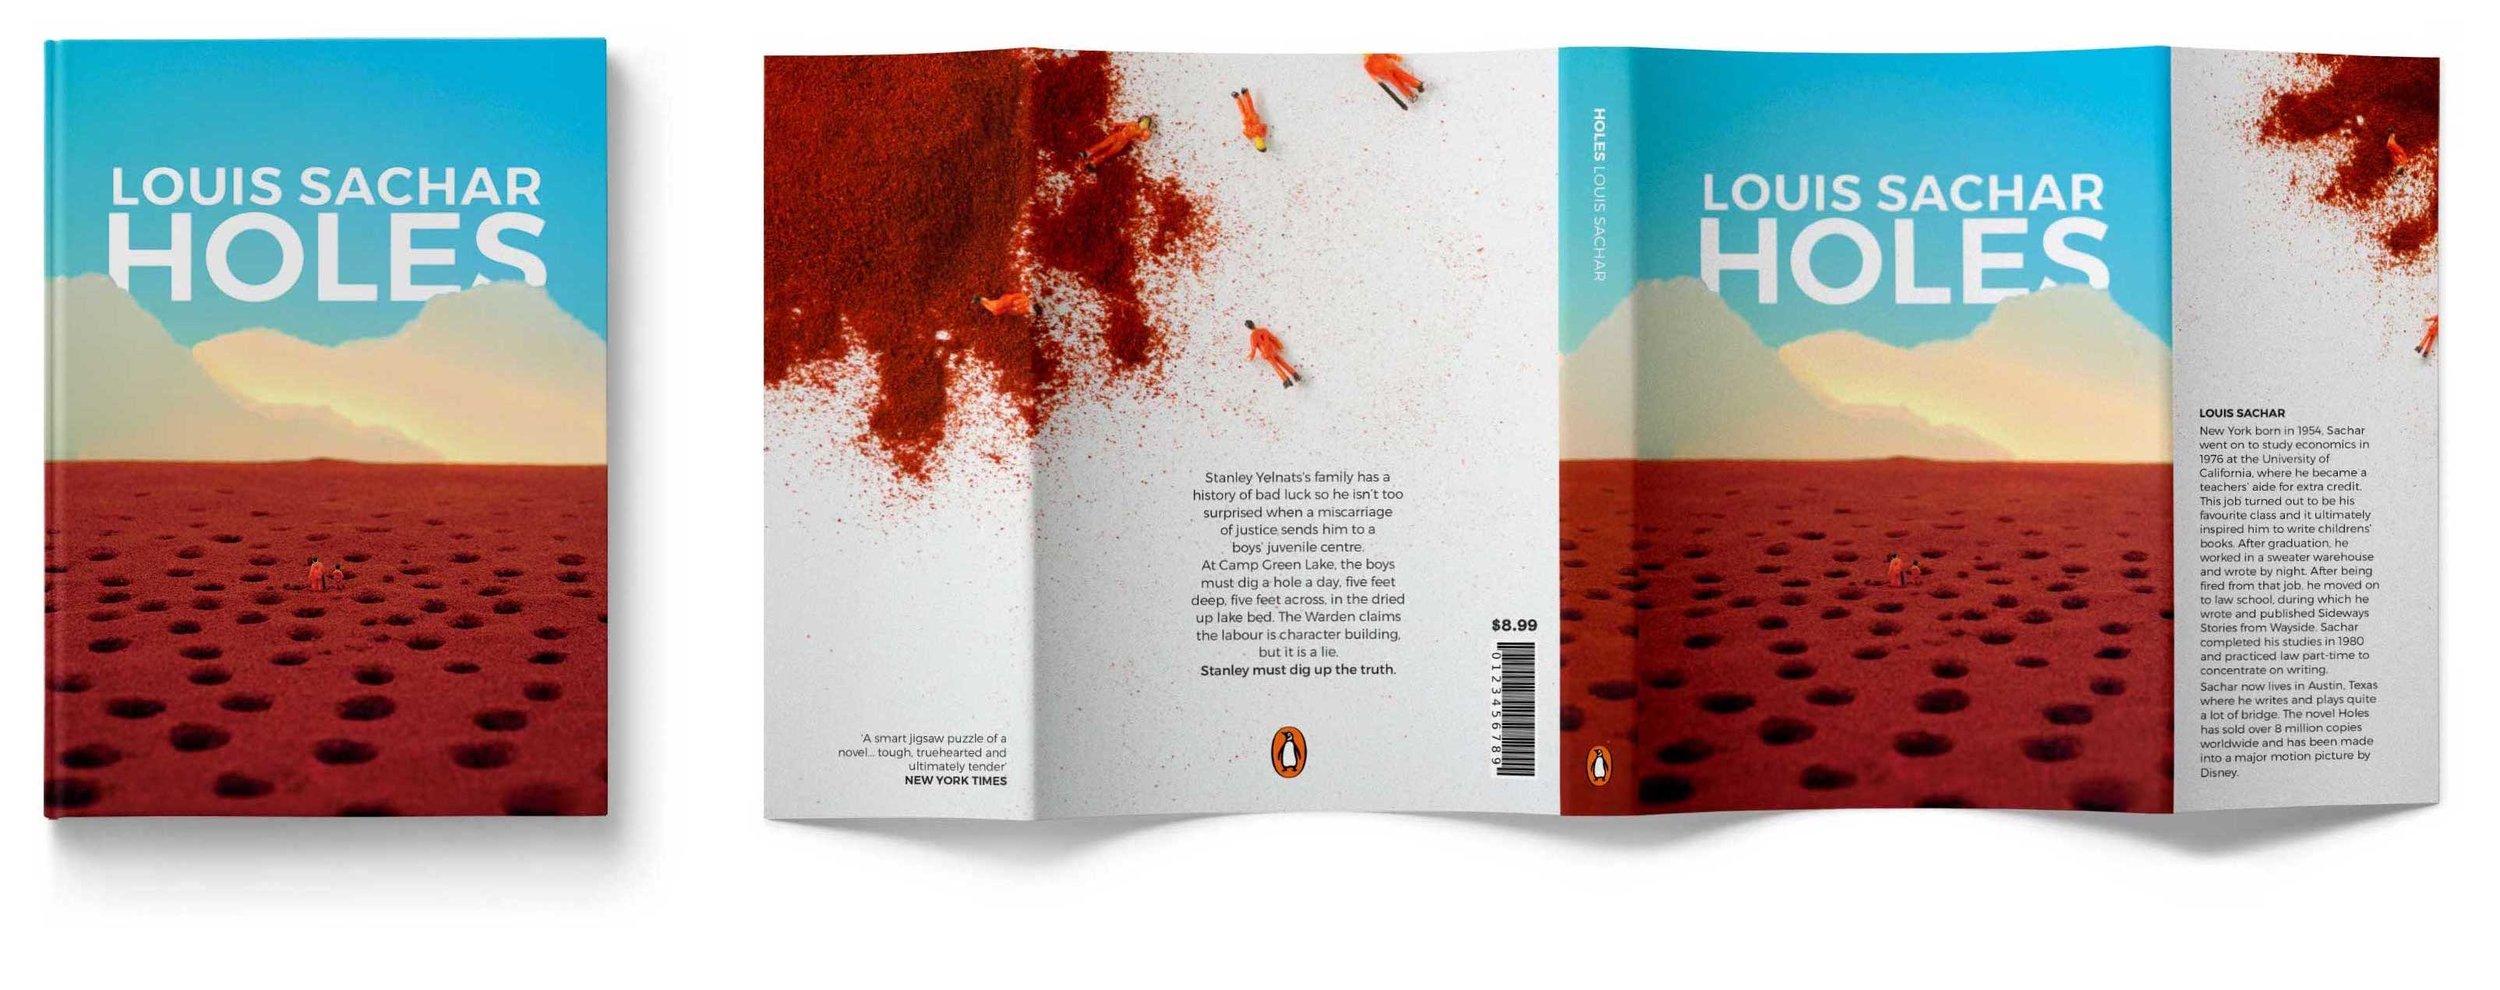 Holes_Book&DustCover.jpg